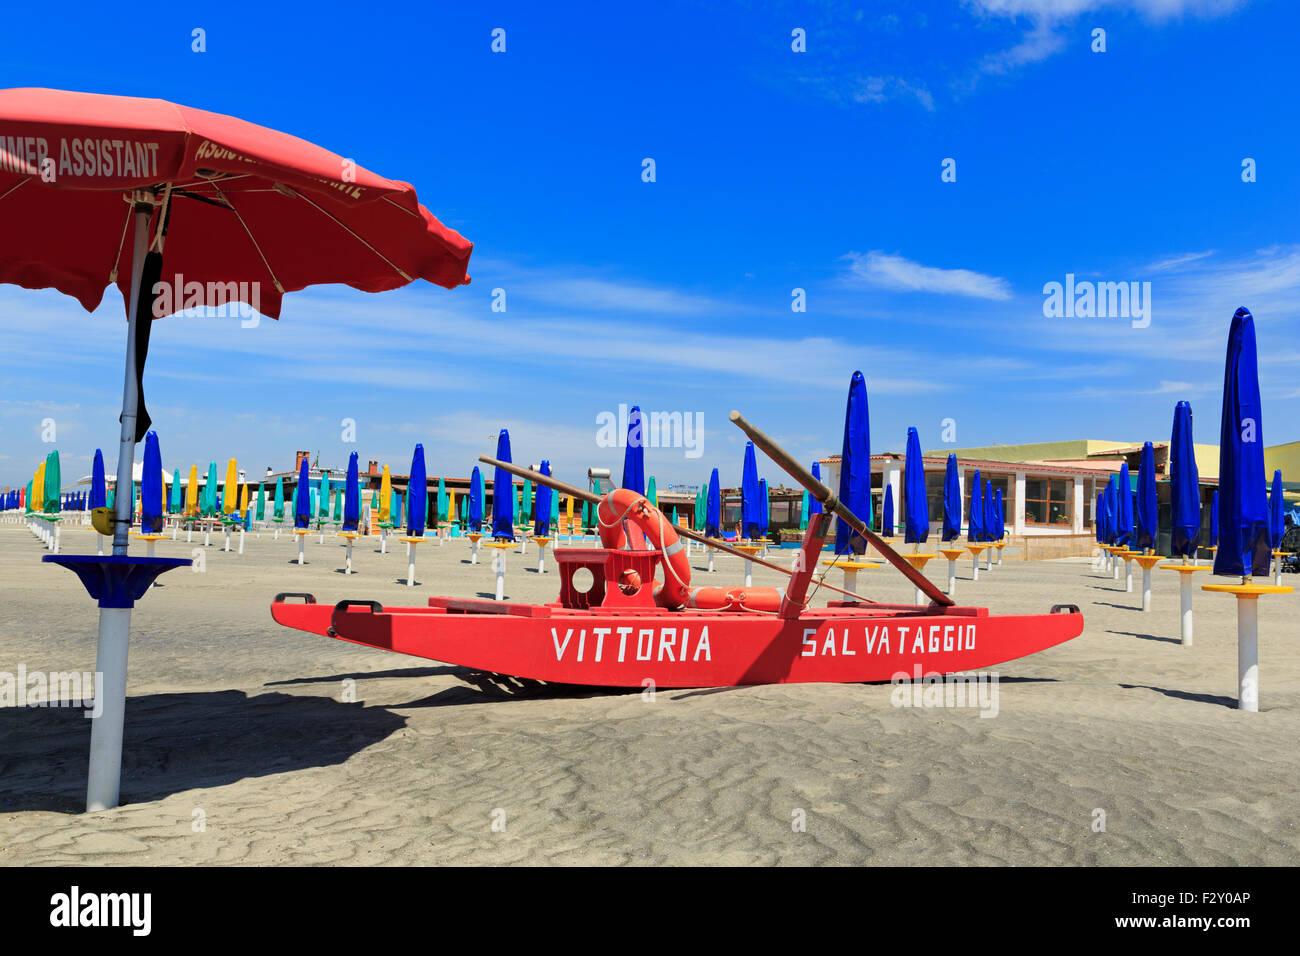 Mare Tirreno Beach, Port of Fiumicino, Rome, Italy, Europe - Stock Image